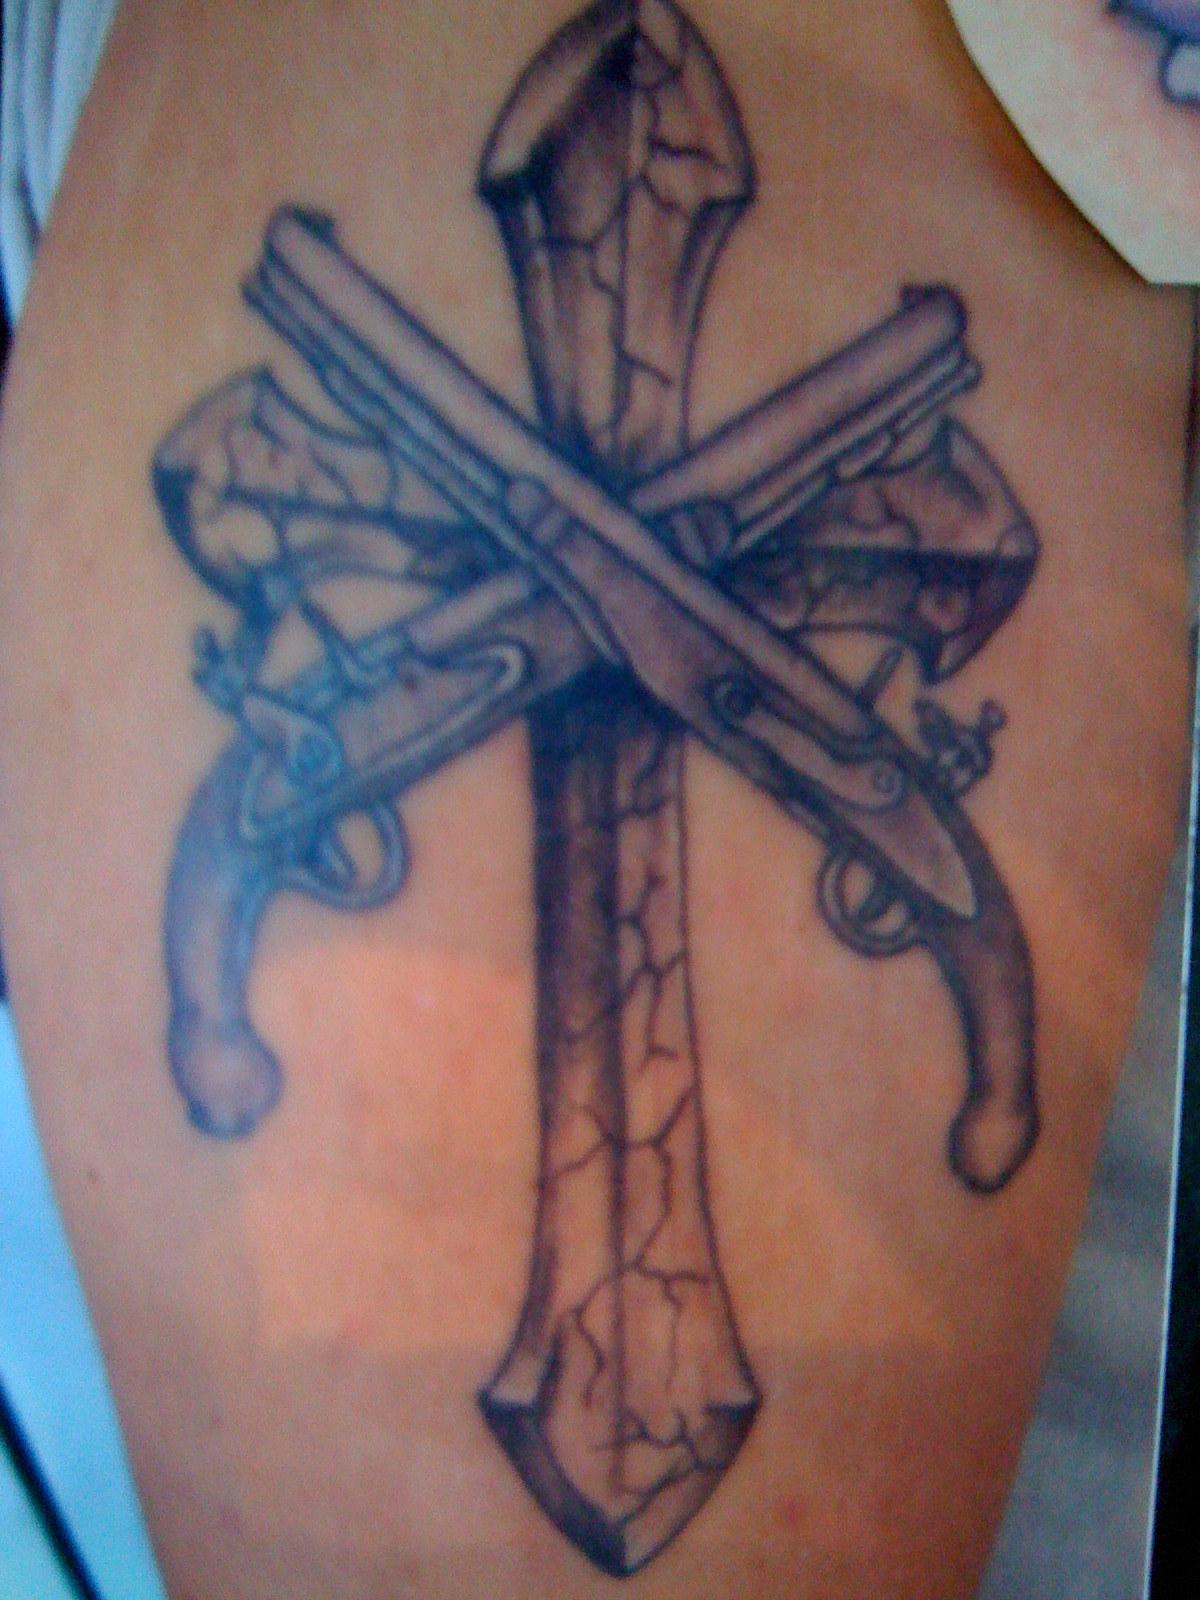 tattoos_004.jpg